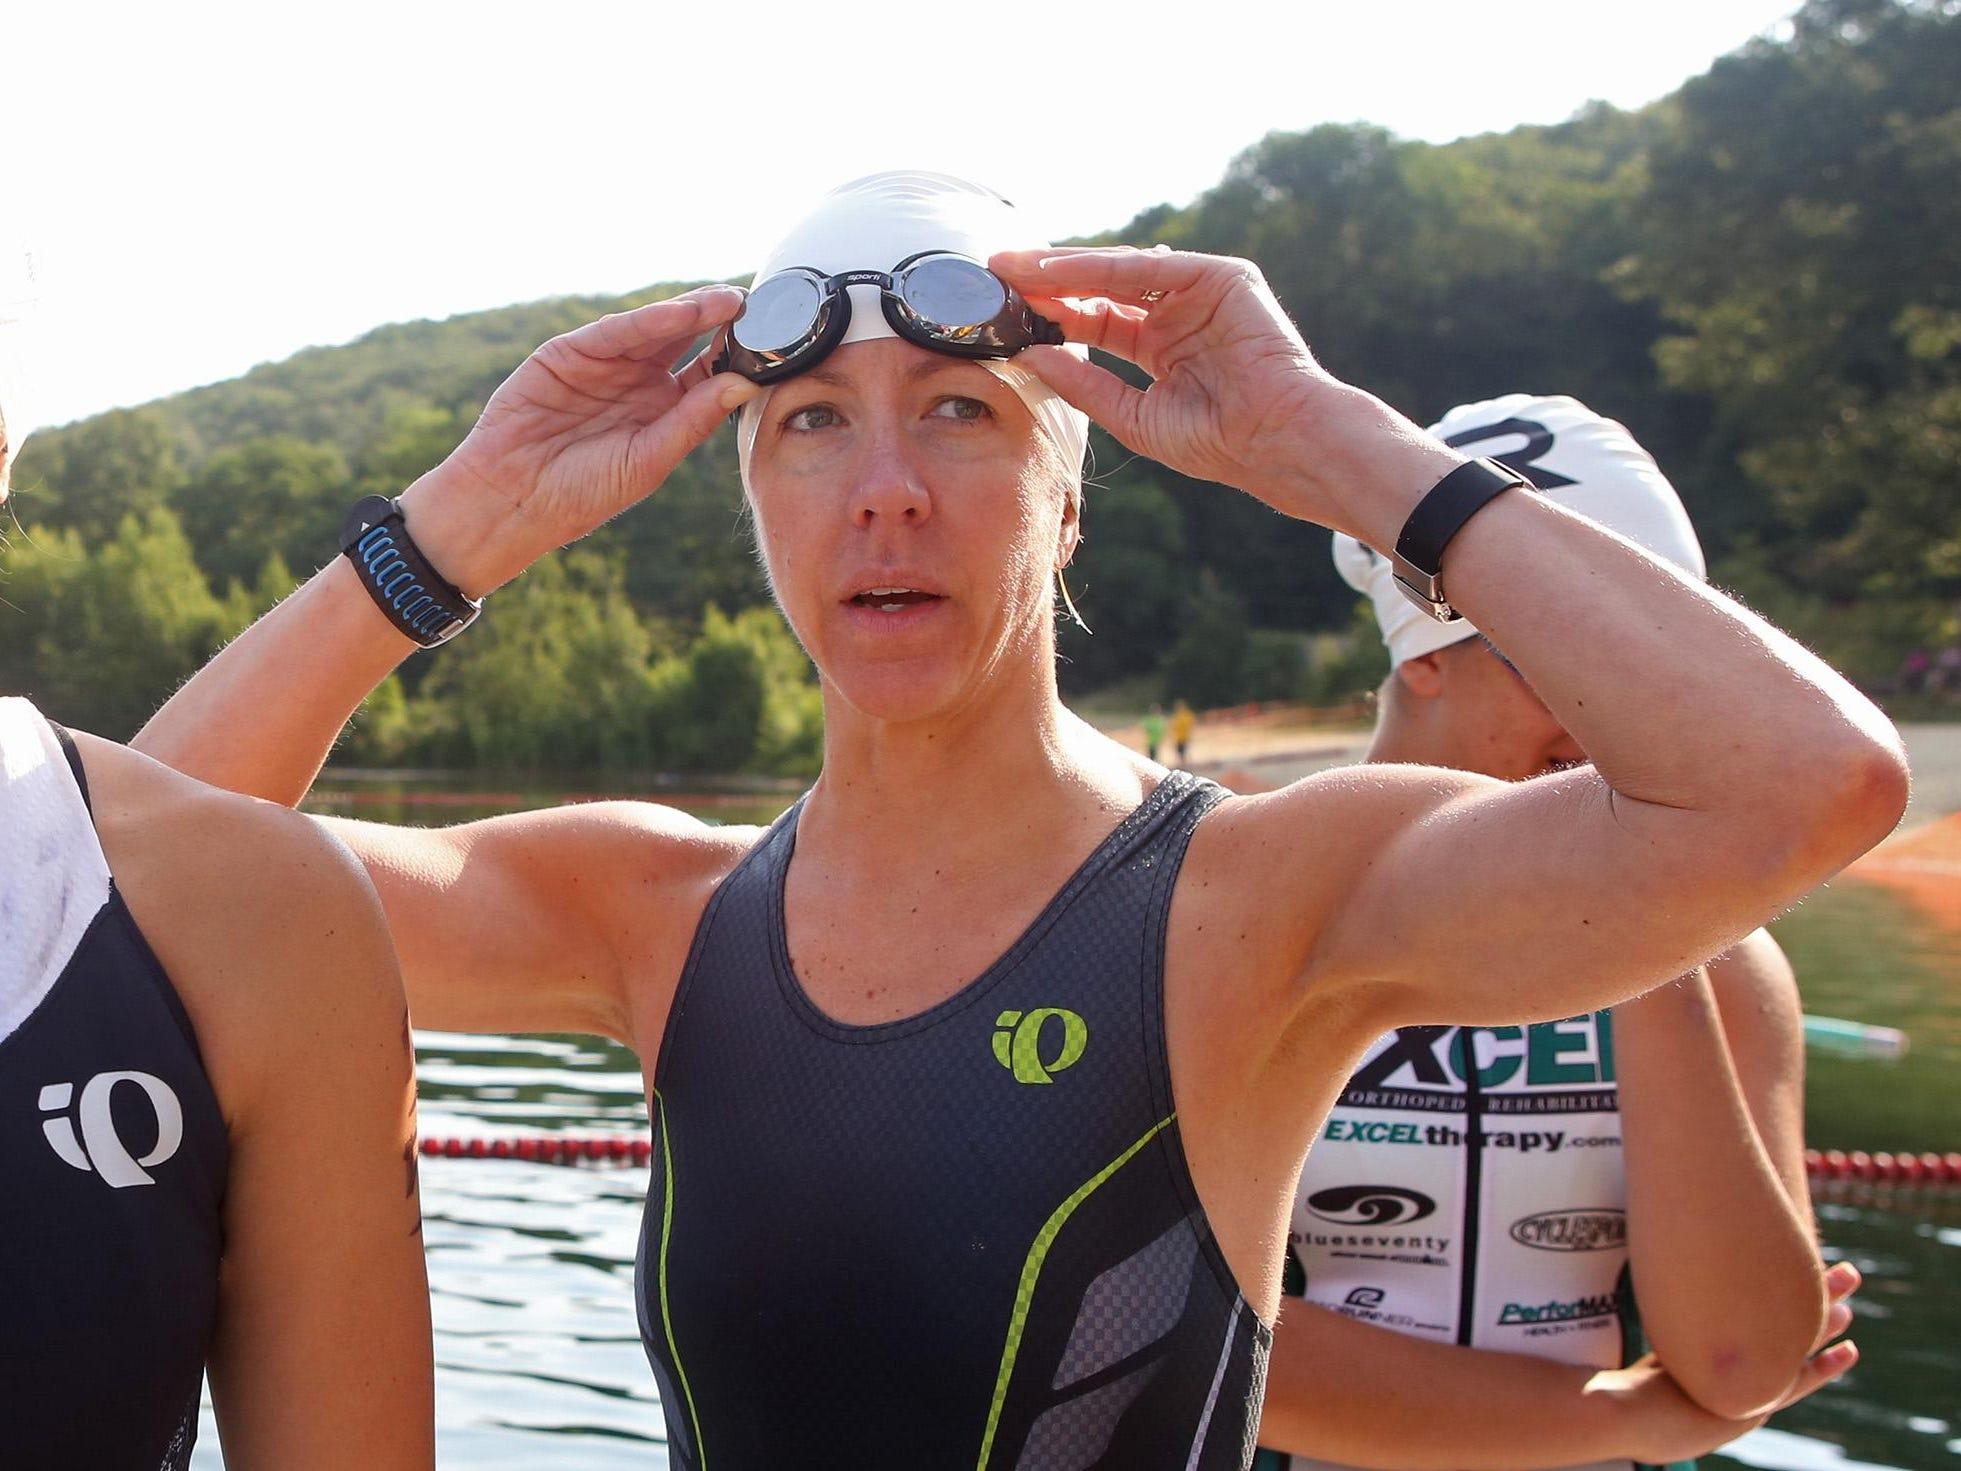 Paula Elejalde, 44, surveys Randolph Lake before starting the annual triathlon. Elejalde finished first in her hometown triathlon.